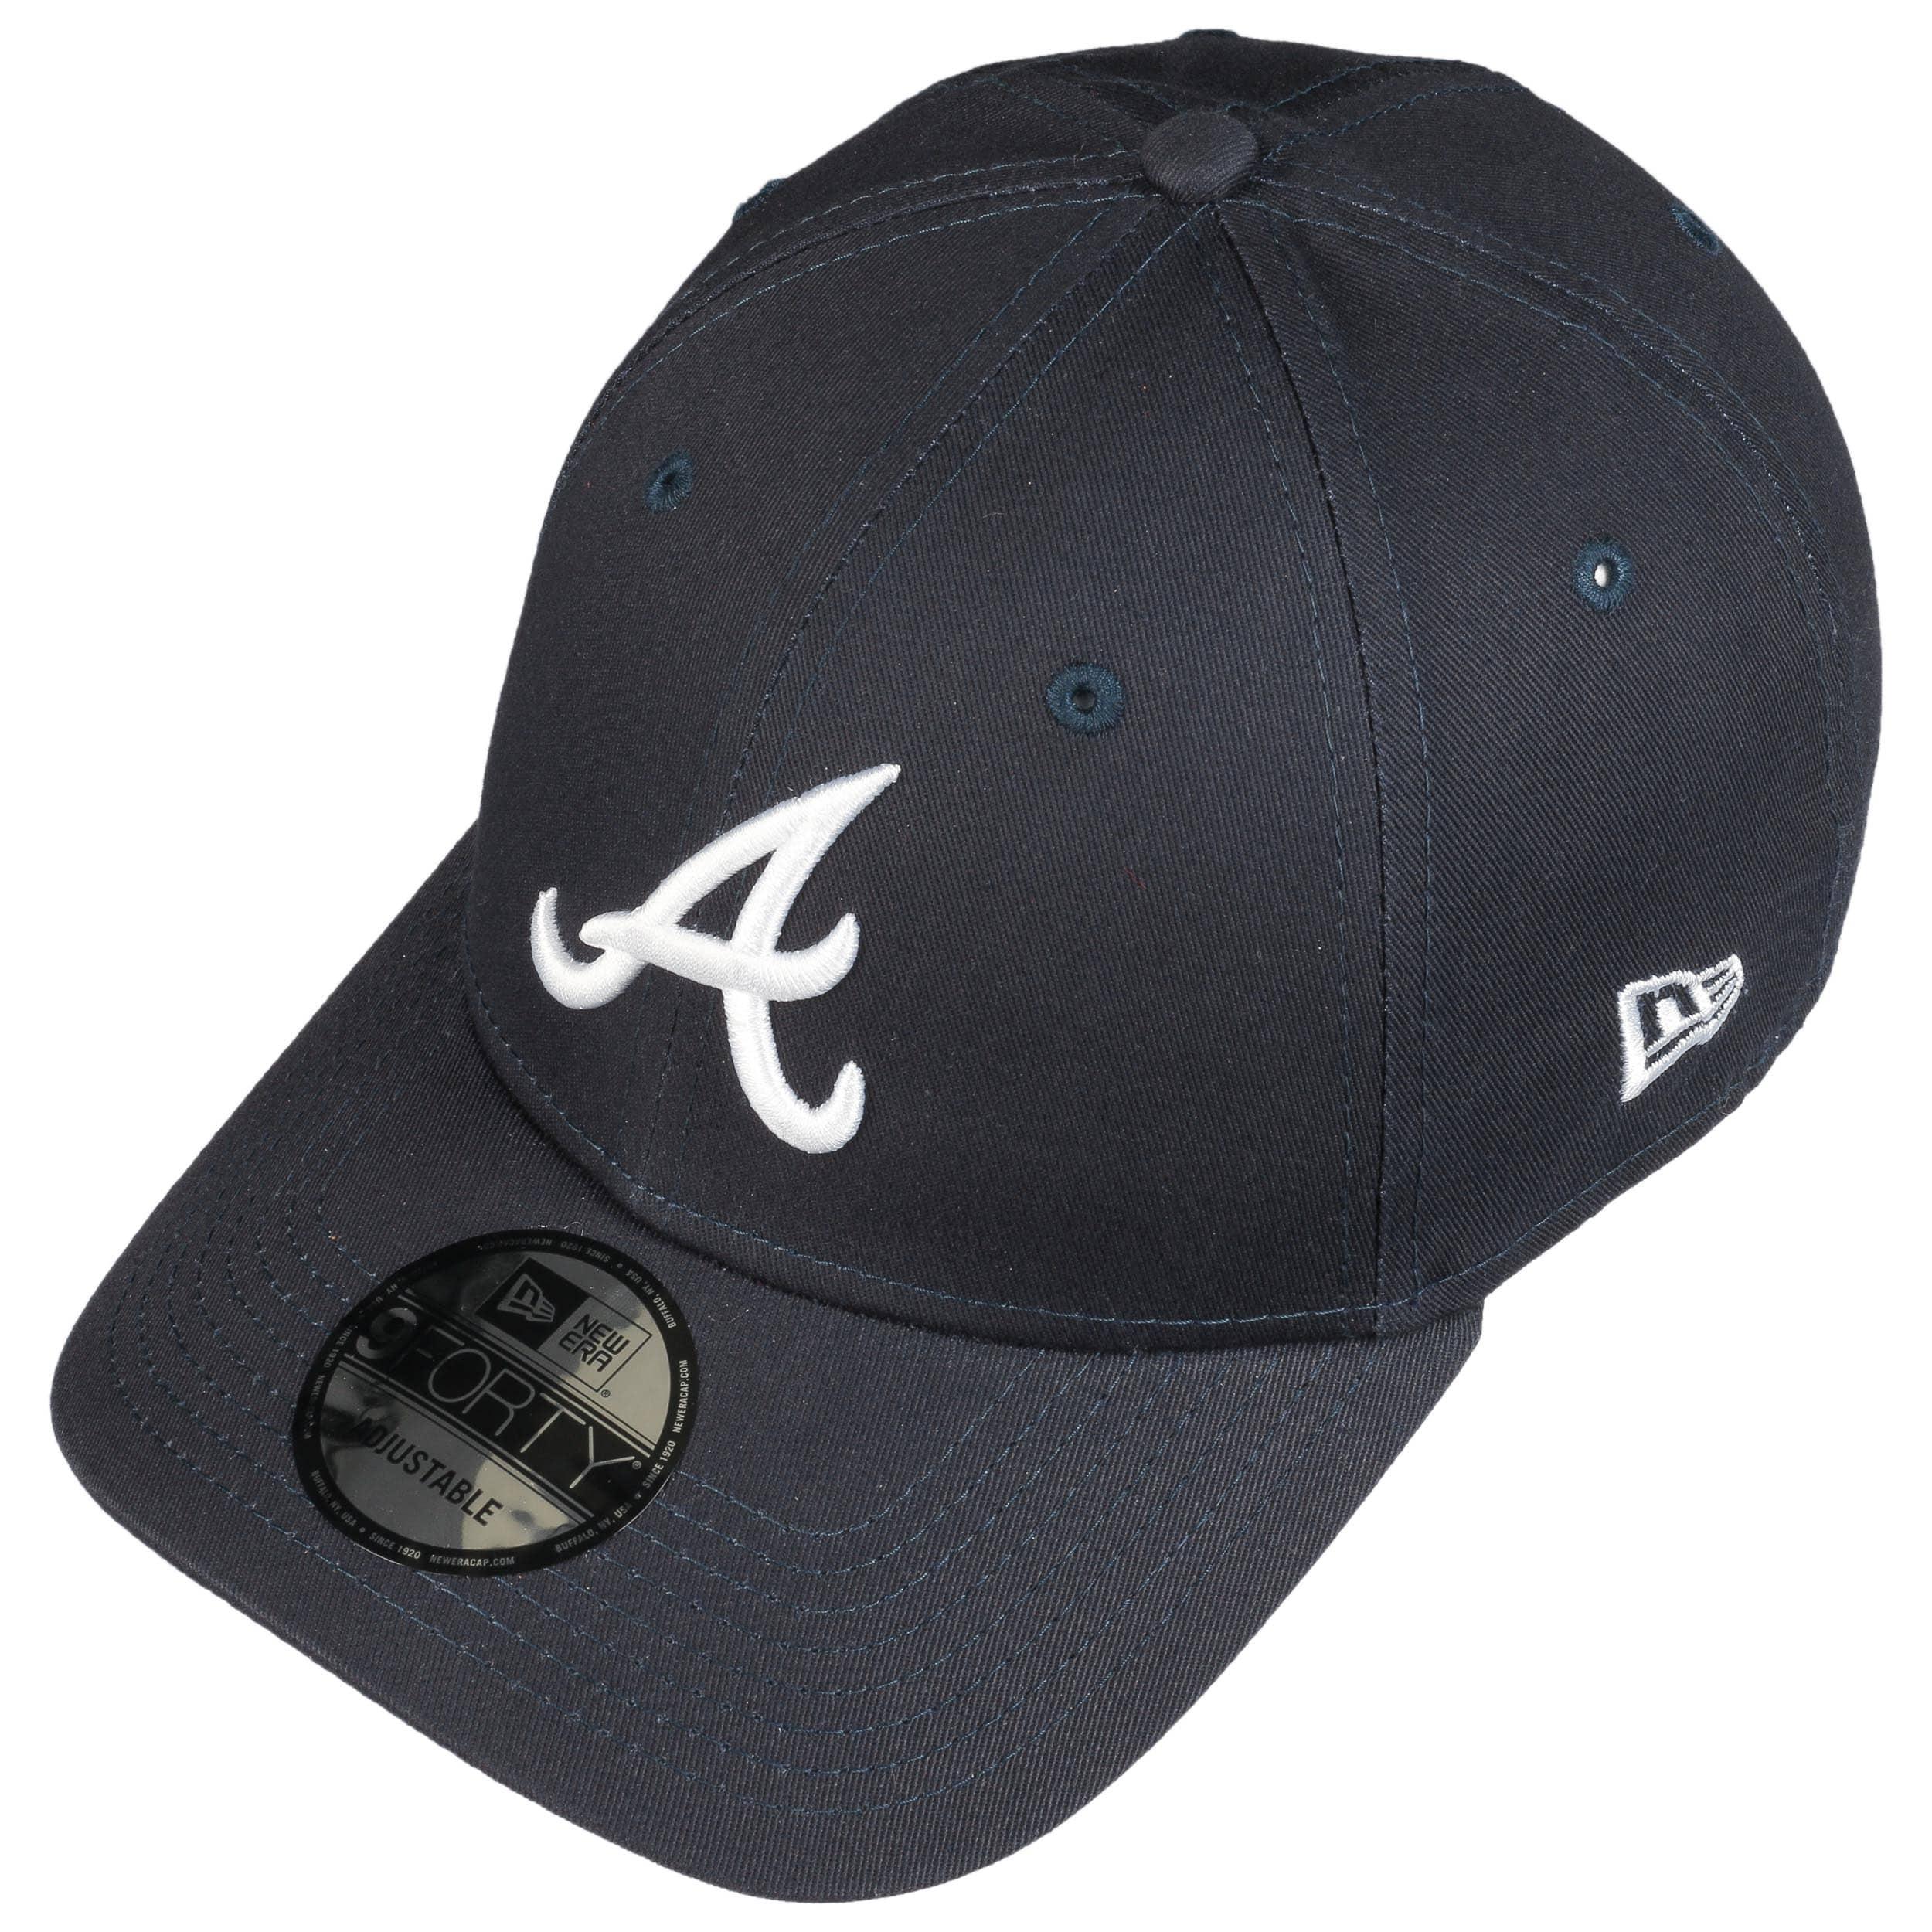 9Forty MLB Ess Braves Cap by New Era - navy 1 ... 0cecb8653d7